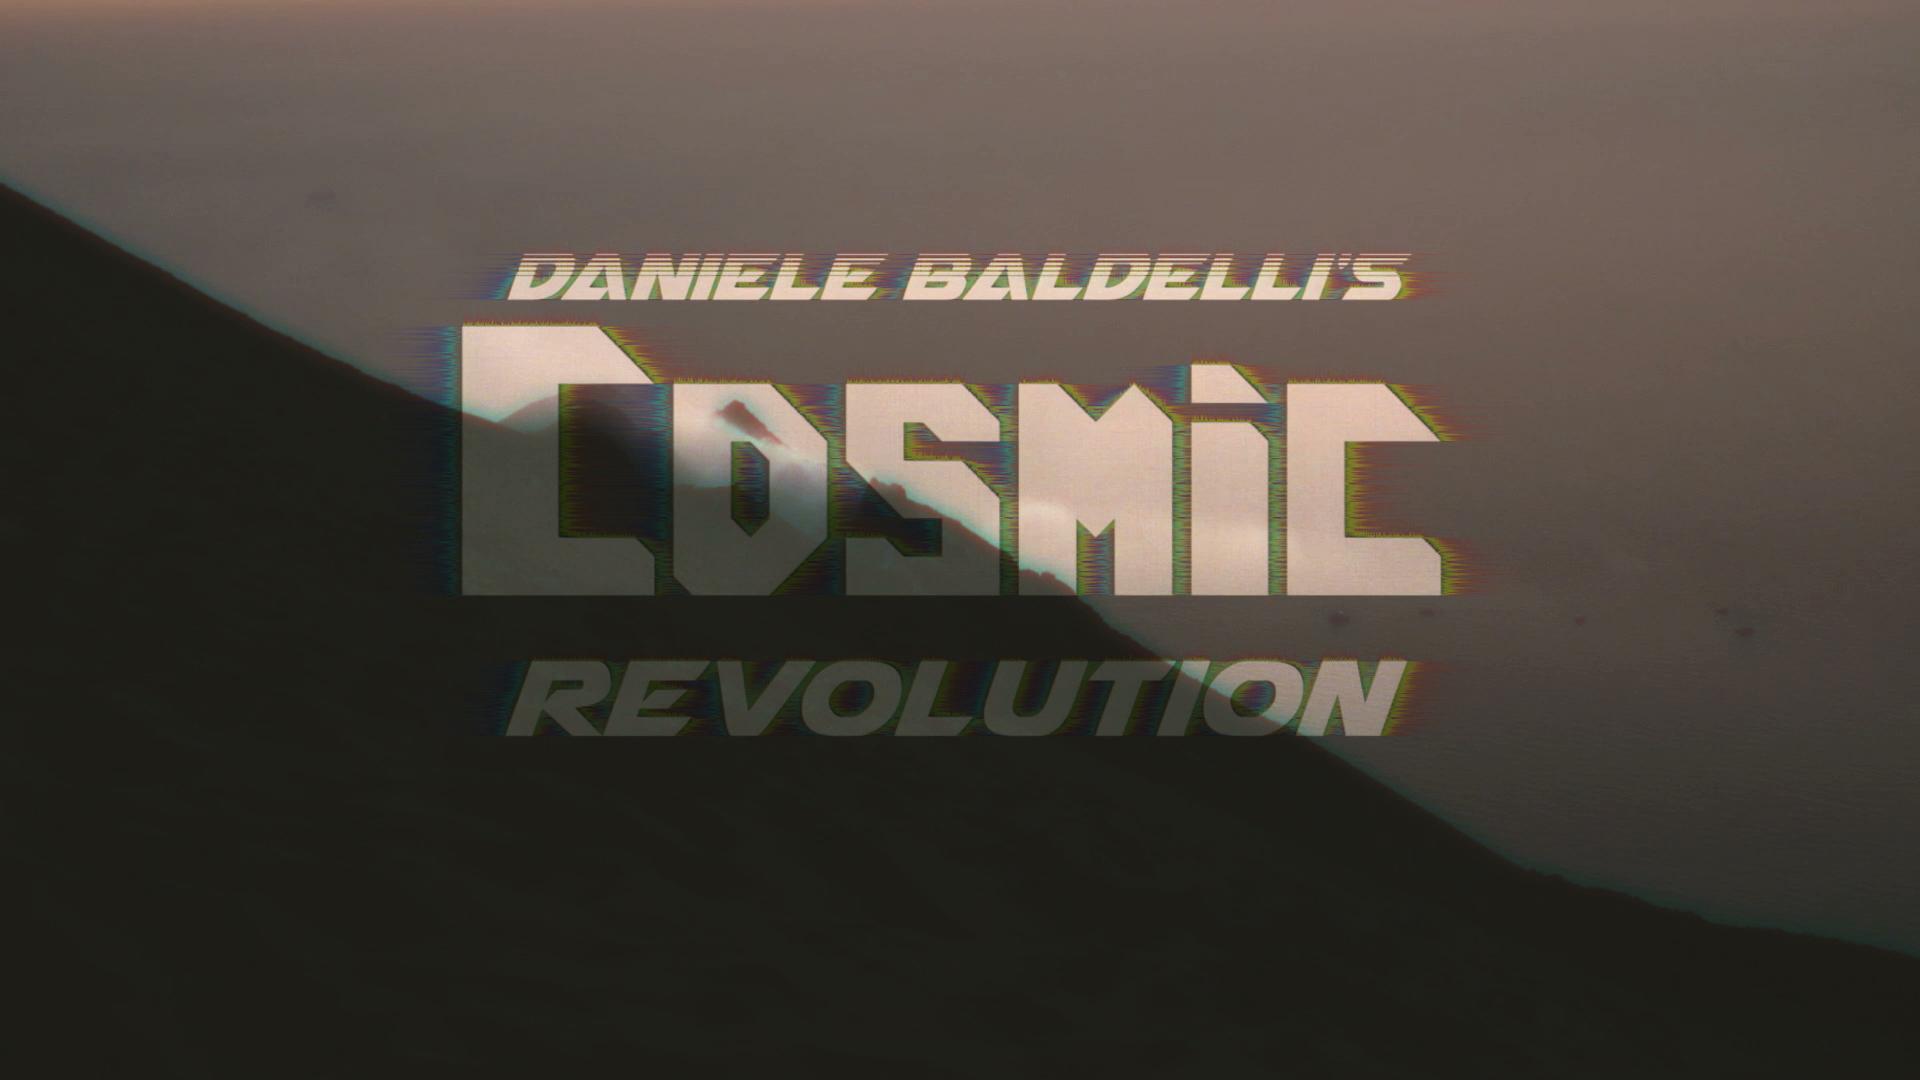 Watch our mini-doc on cosmic disco pioneer Daniele Baldelli